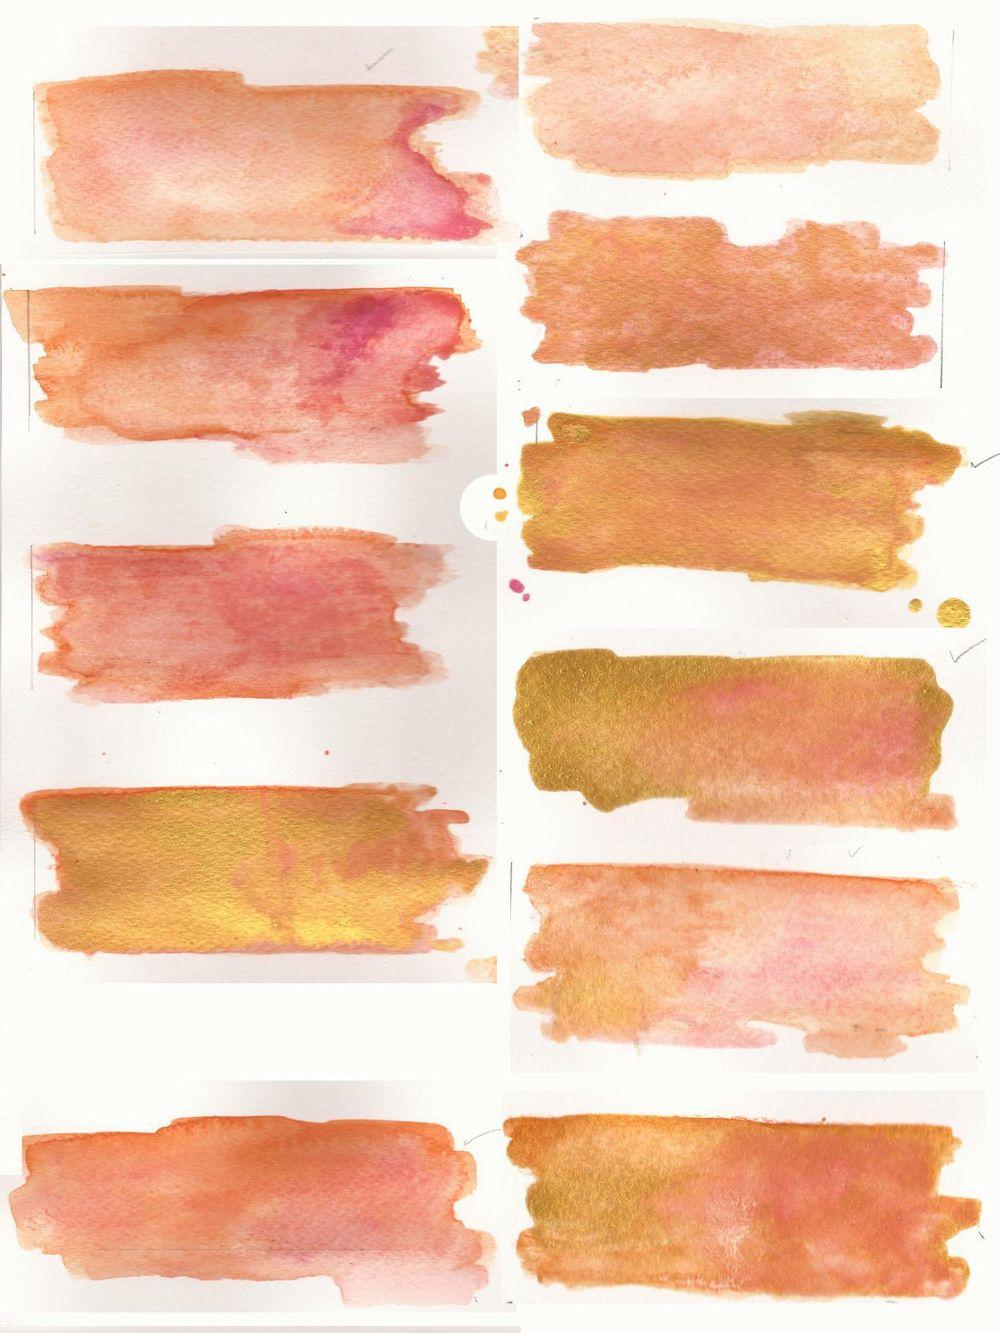 Nicole Gilford; Micro-blading brow artist - image 5 - student project